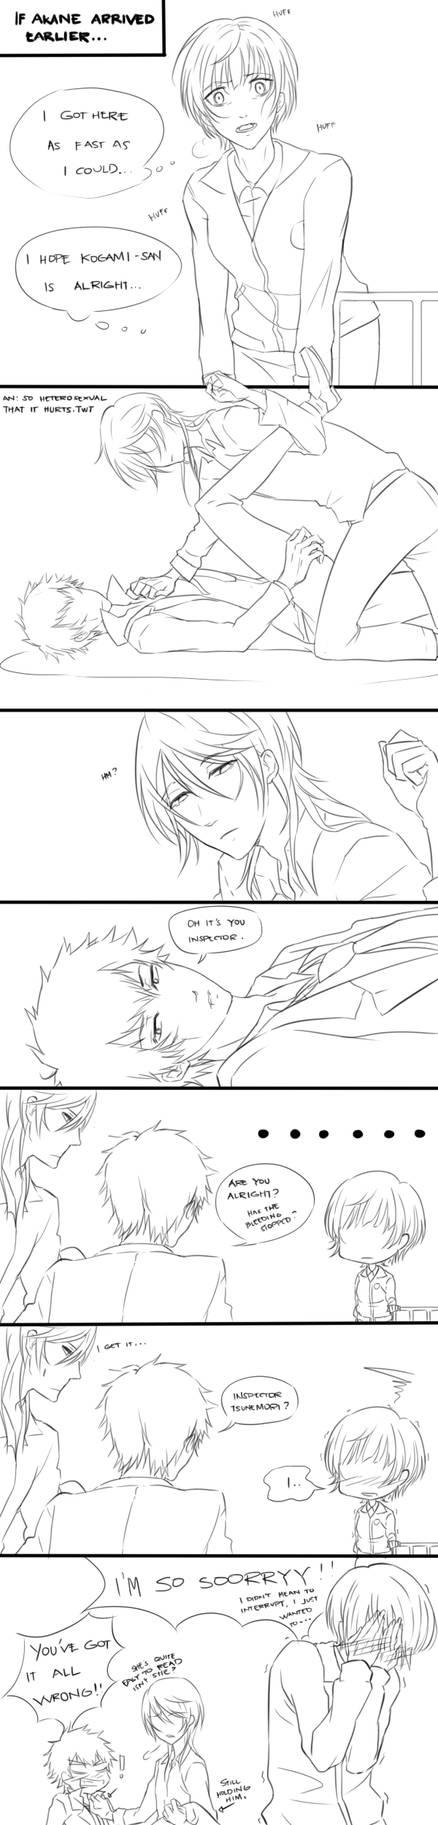 If Akane arrived earlier...